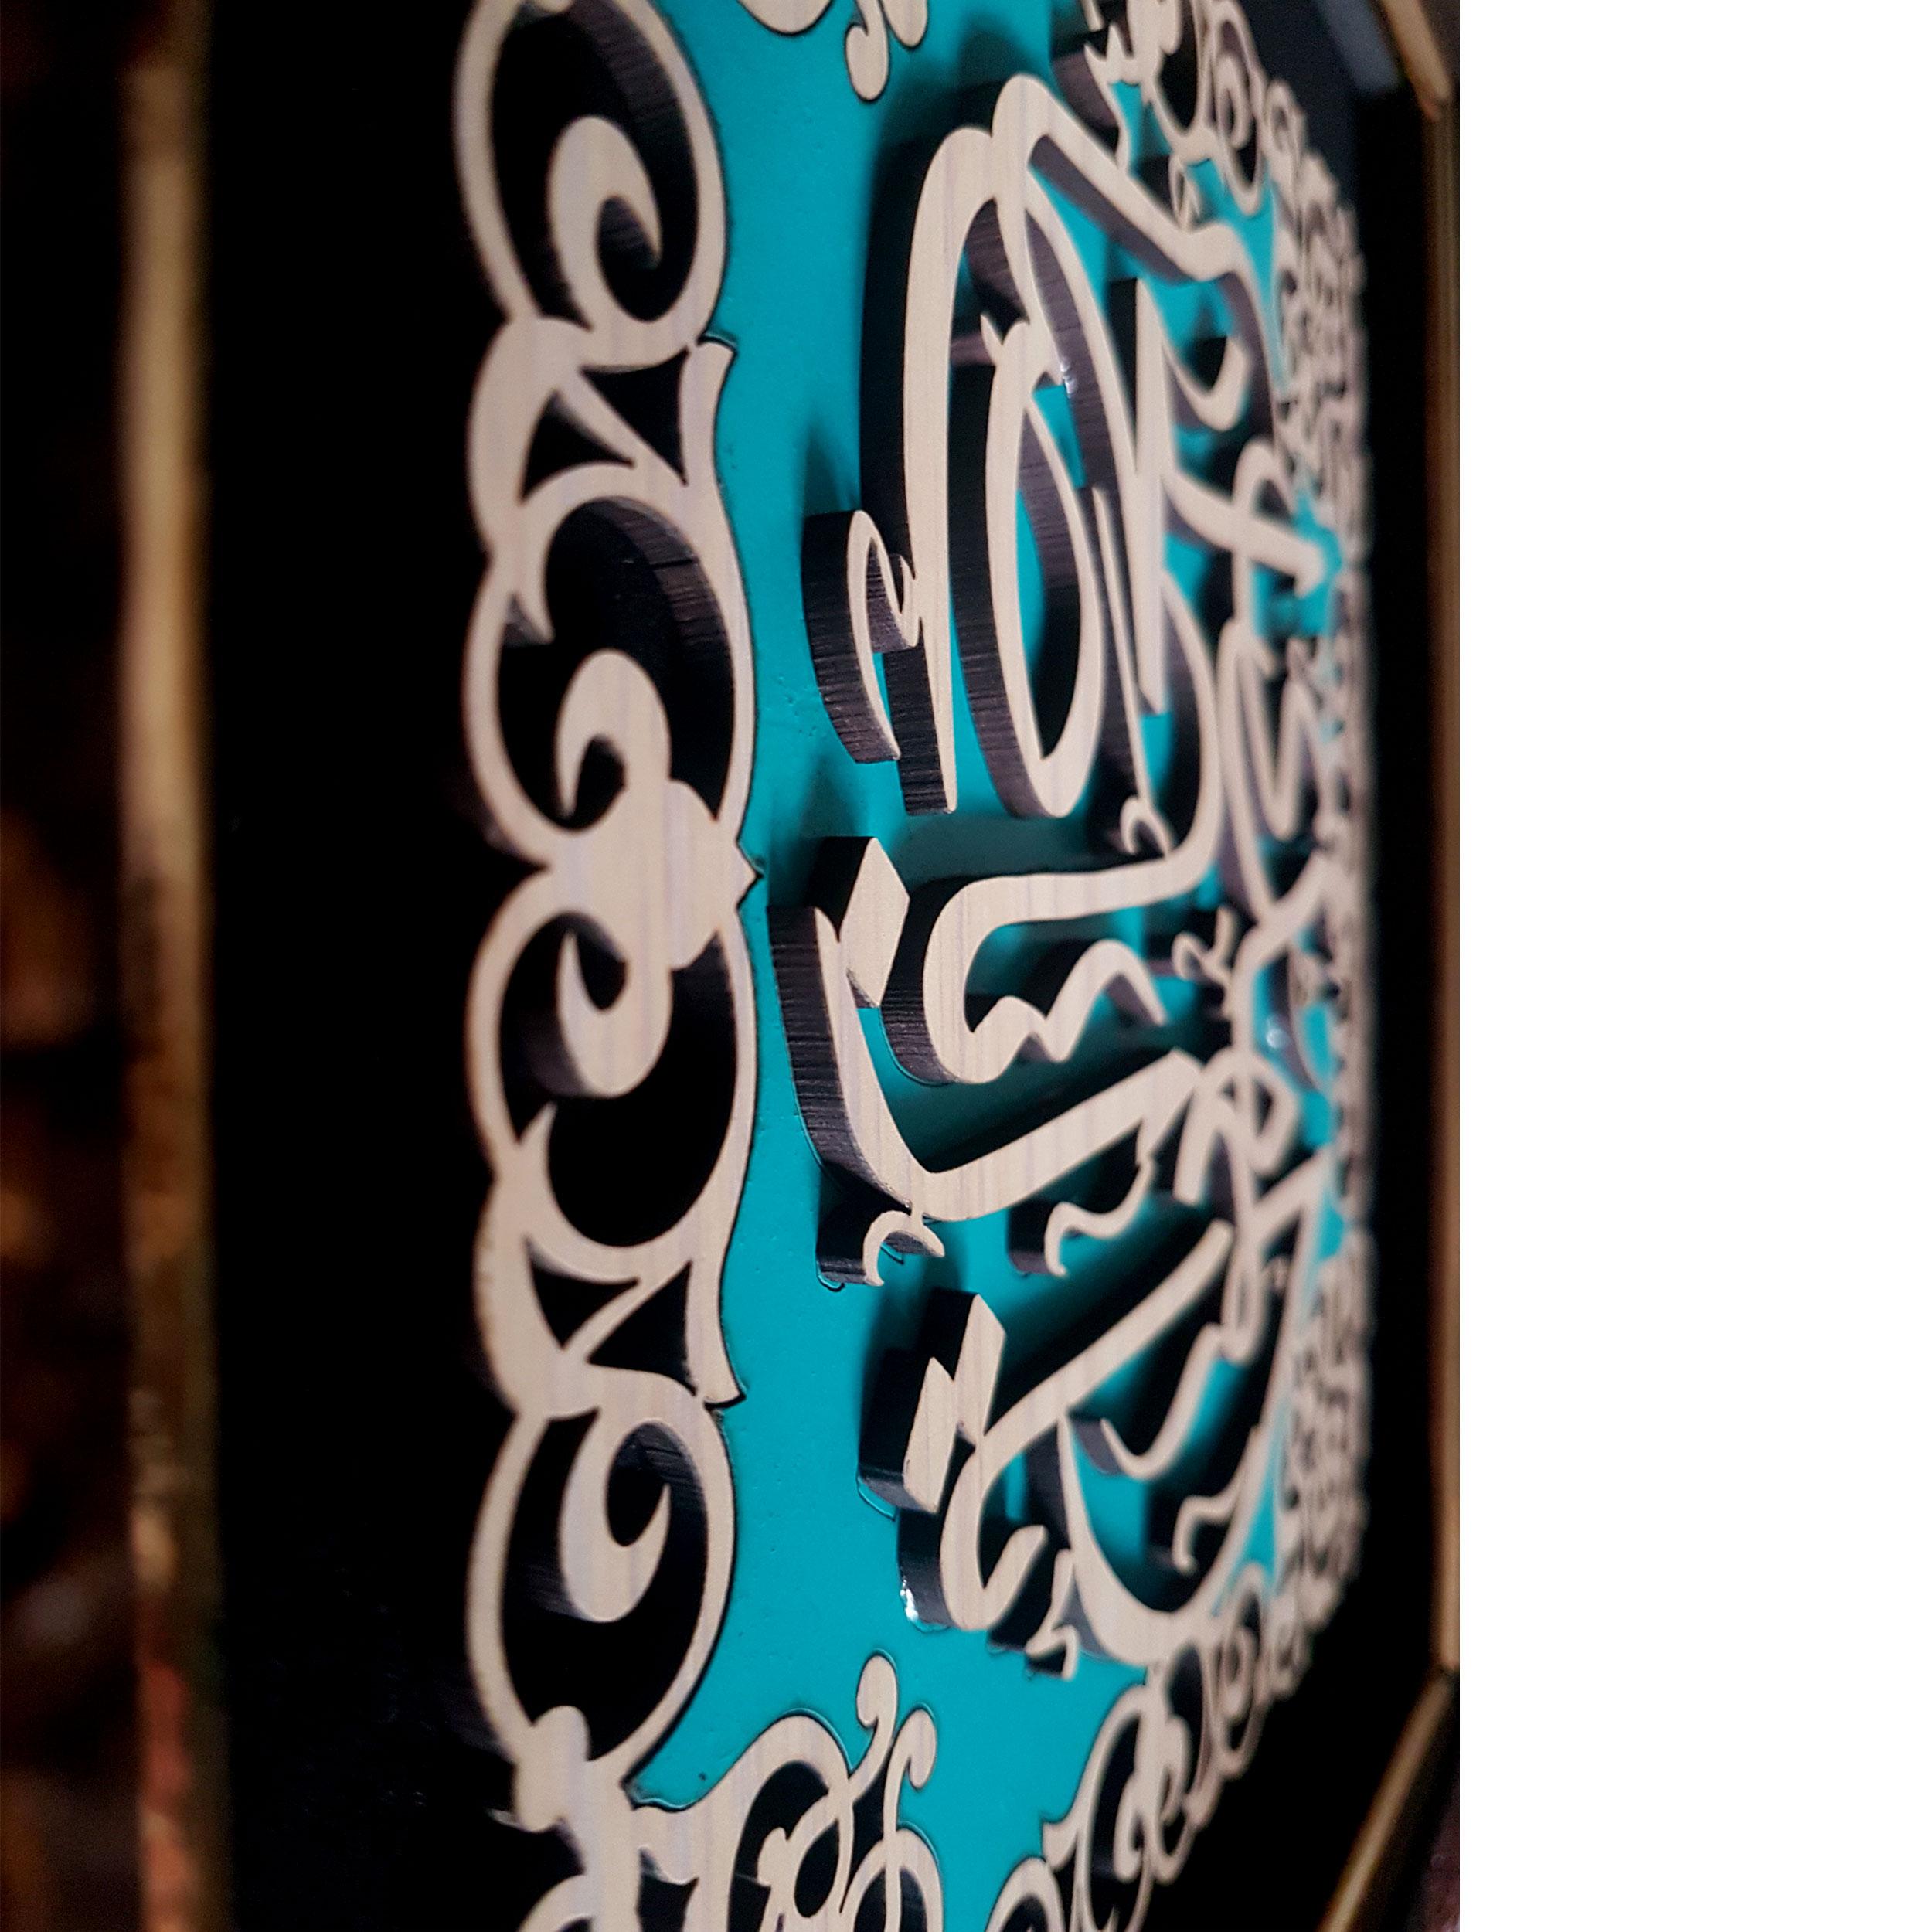 خرید                      تابلو معرق کاری طرح خوشنویسی اباصالح المهدی  عج ا.. کد G696-21